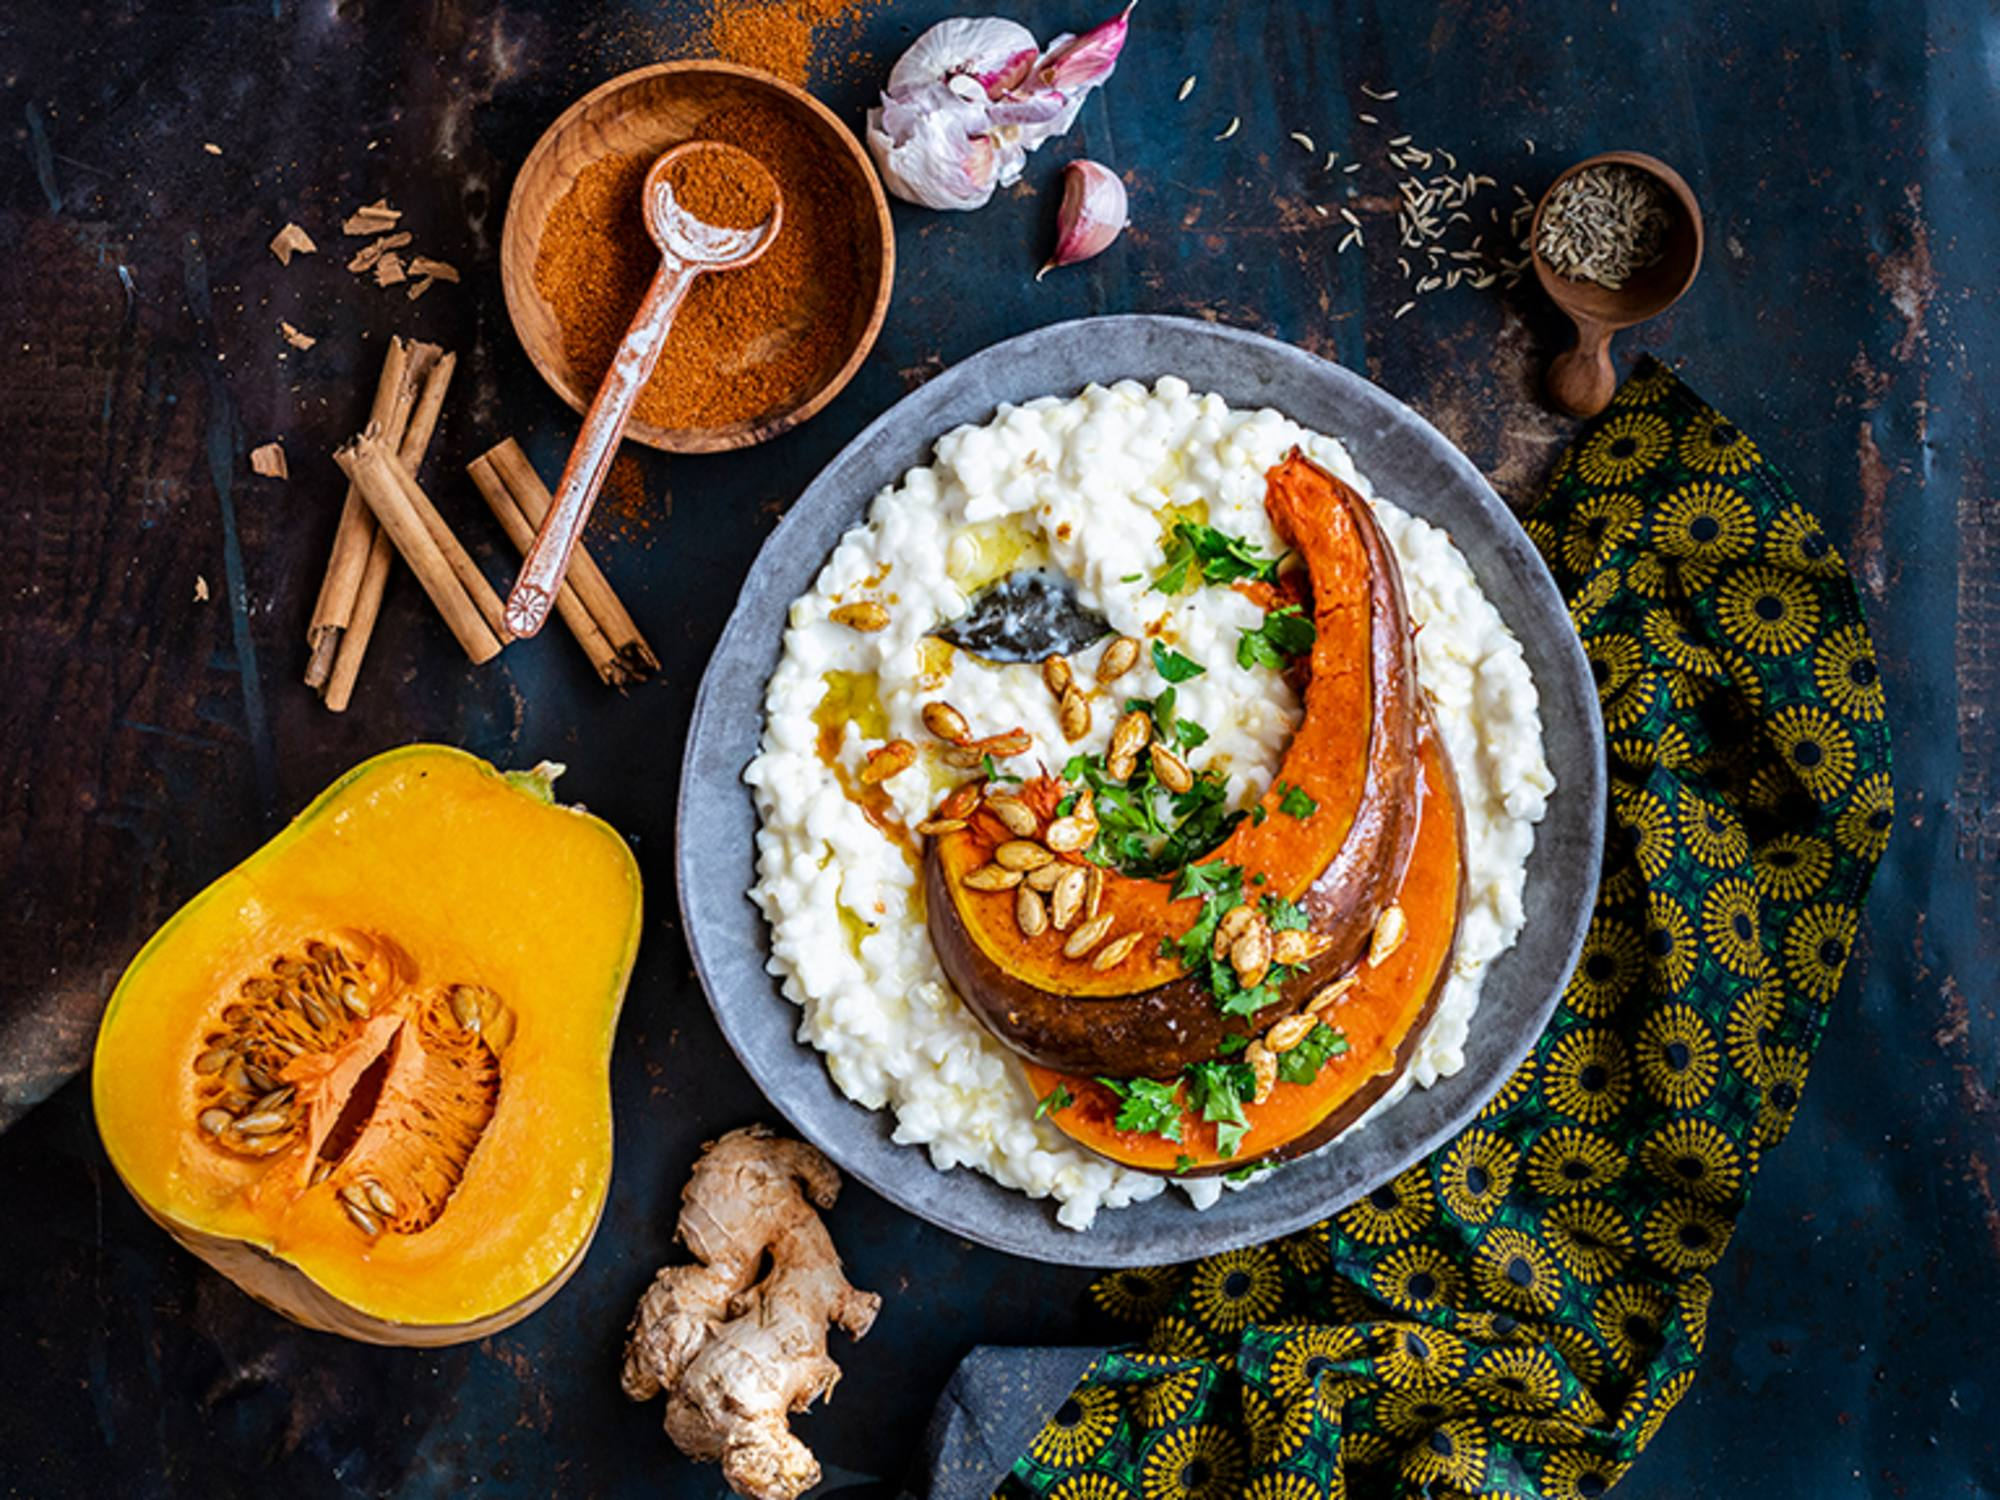 Masala-Roasted Pumpkin with Creamy Samp